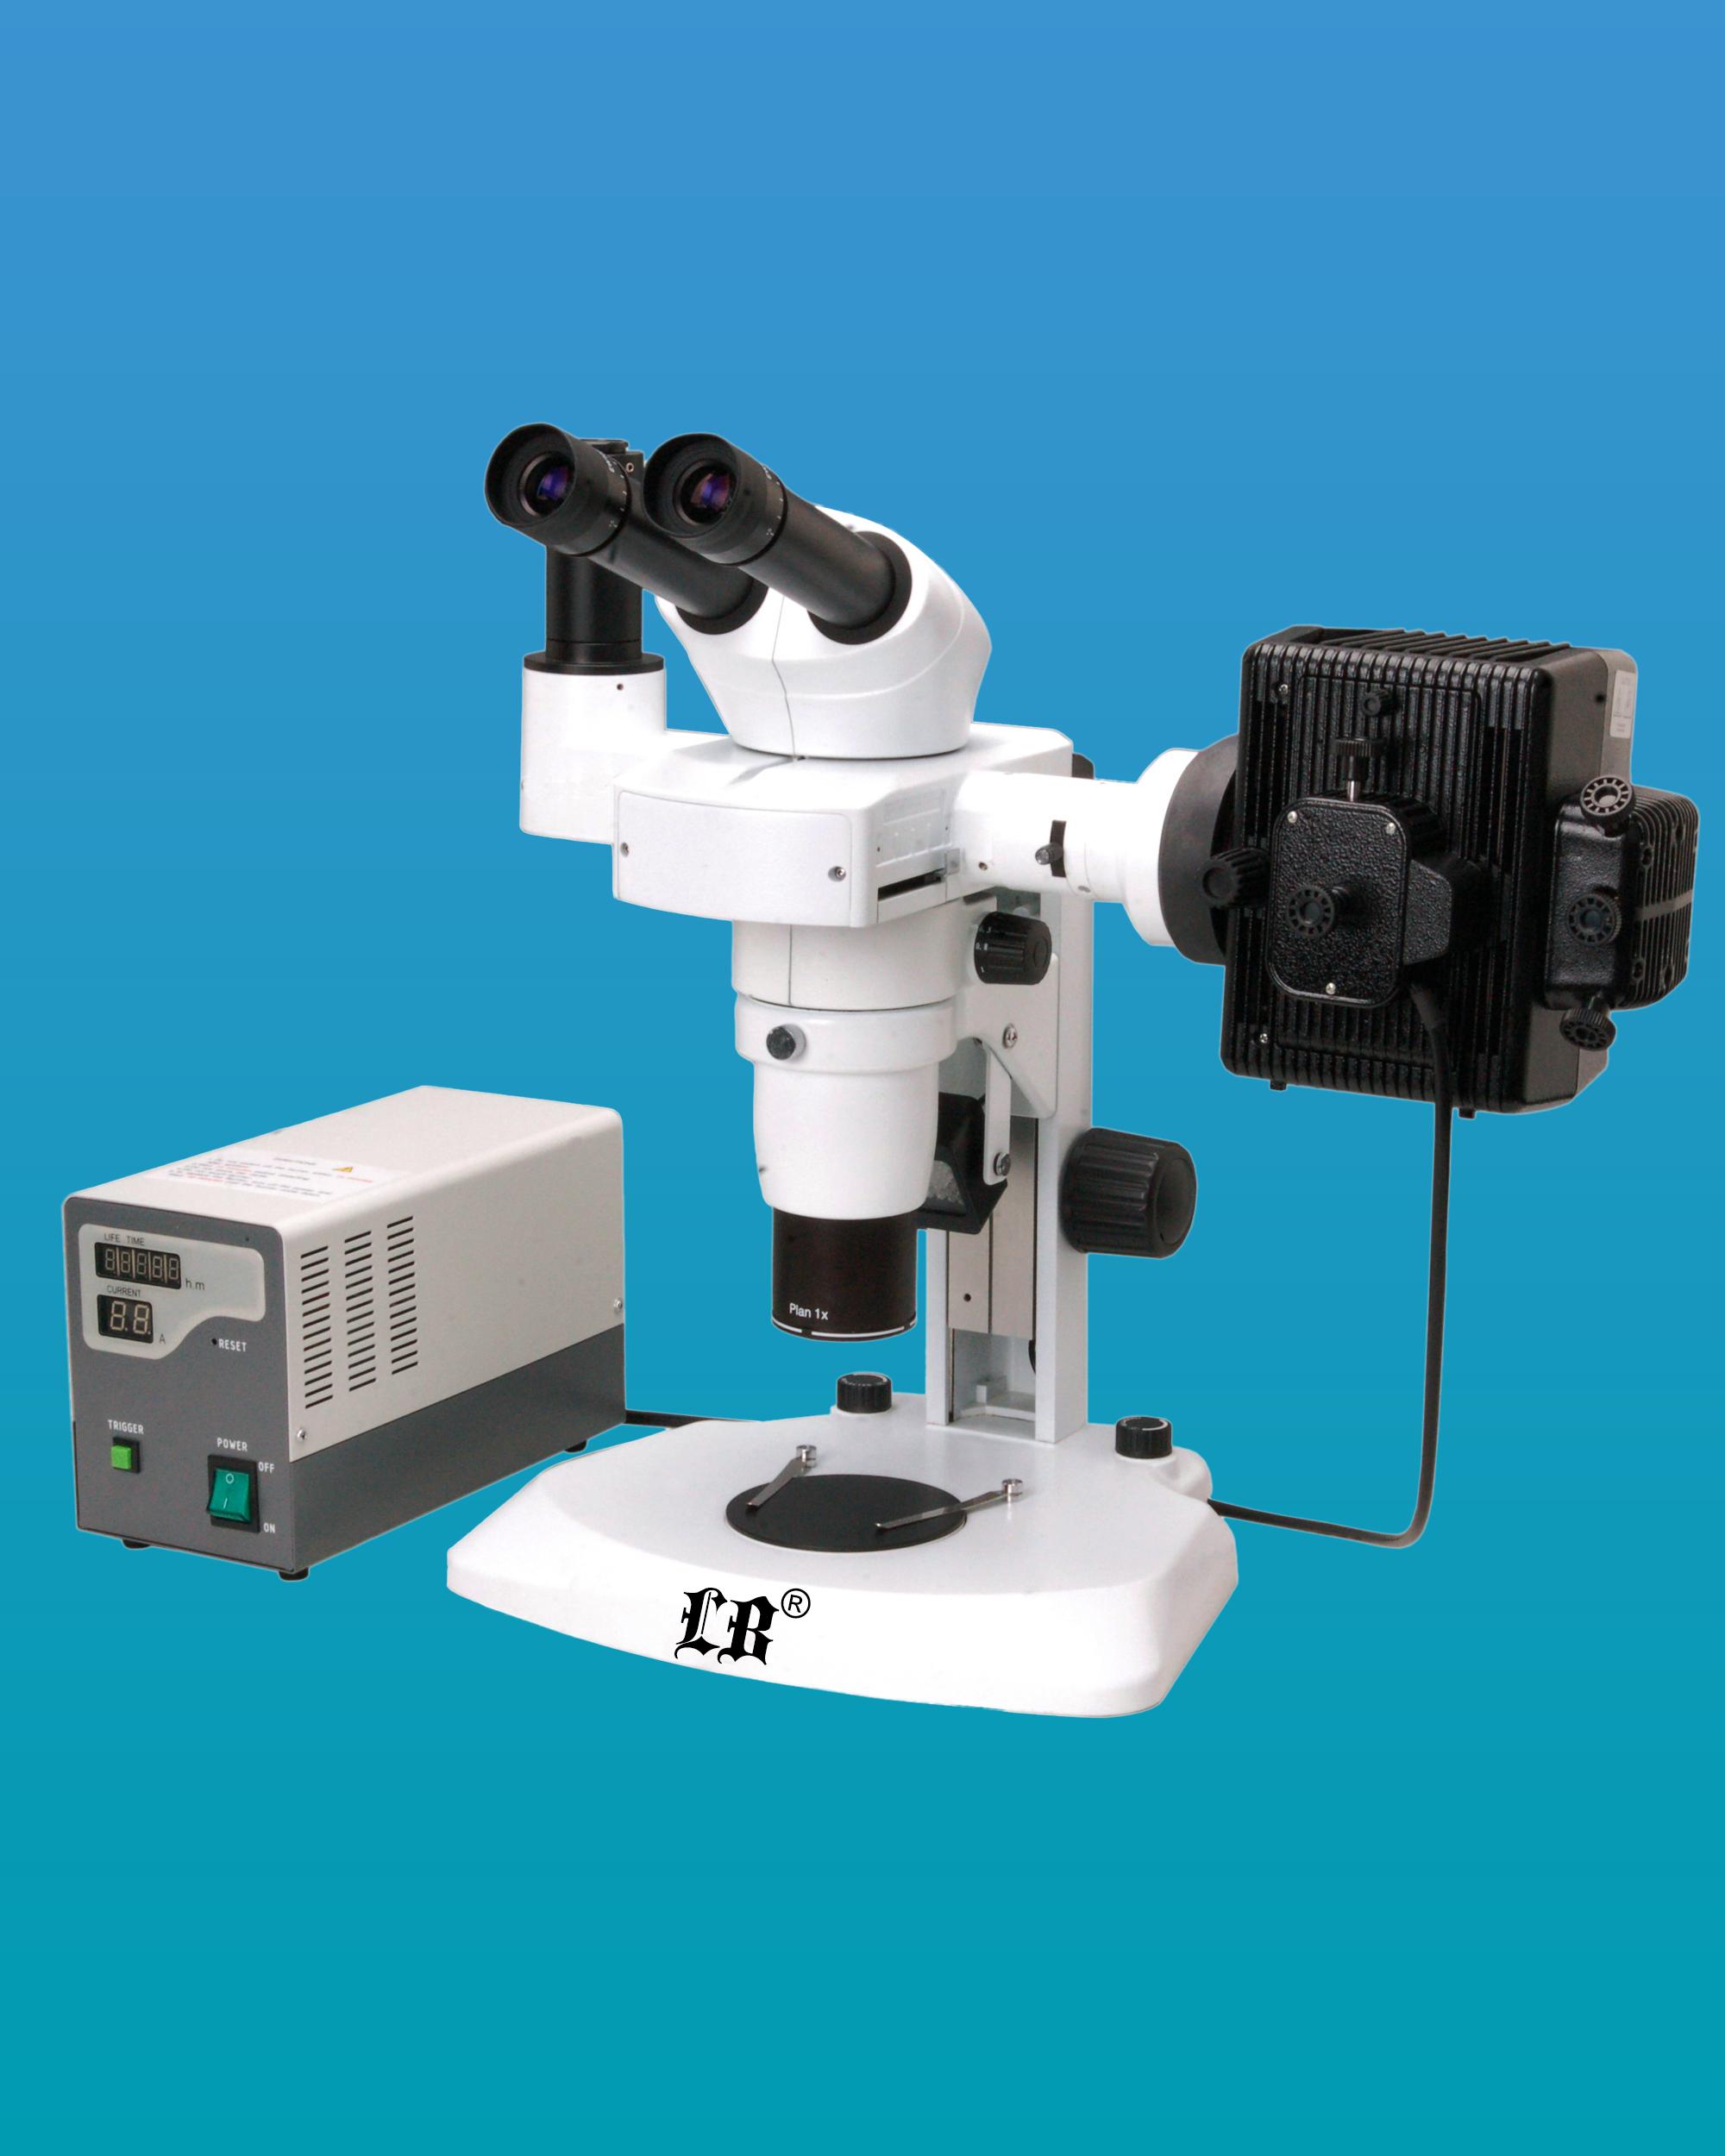 [LB-367] Binocular Zoom Fluorescent Stereo Microscope w/ Infinite Parallel Zoom Optical System & LED Illumination